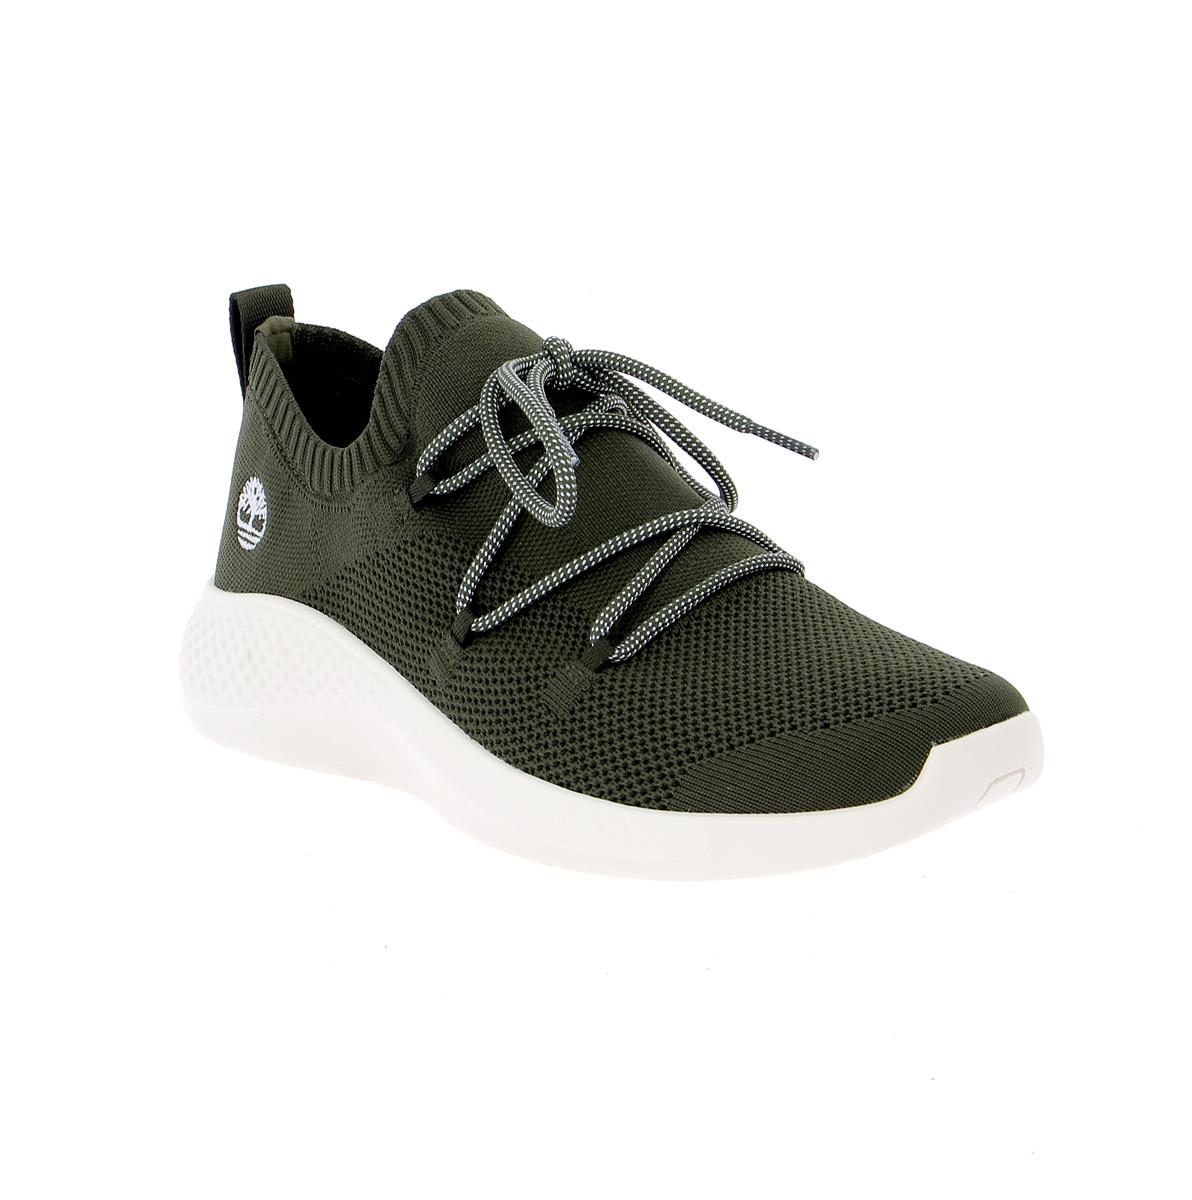 Timberland Sneakers kaki